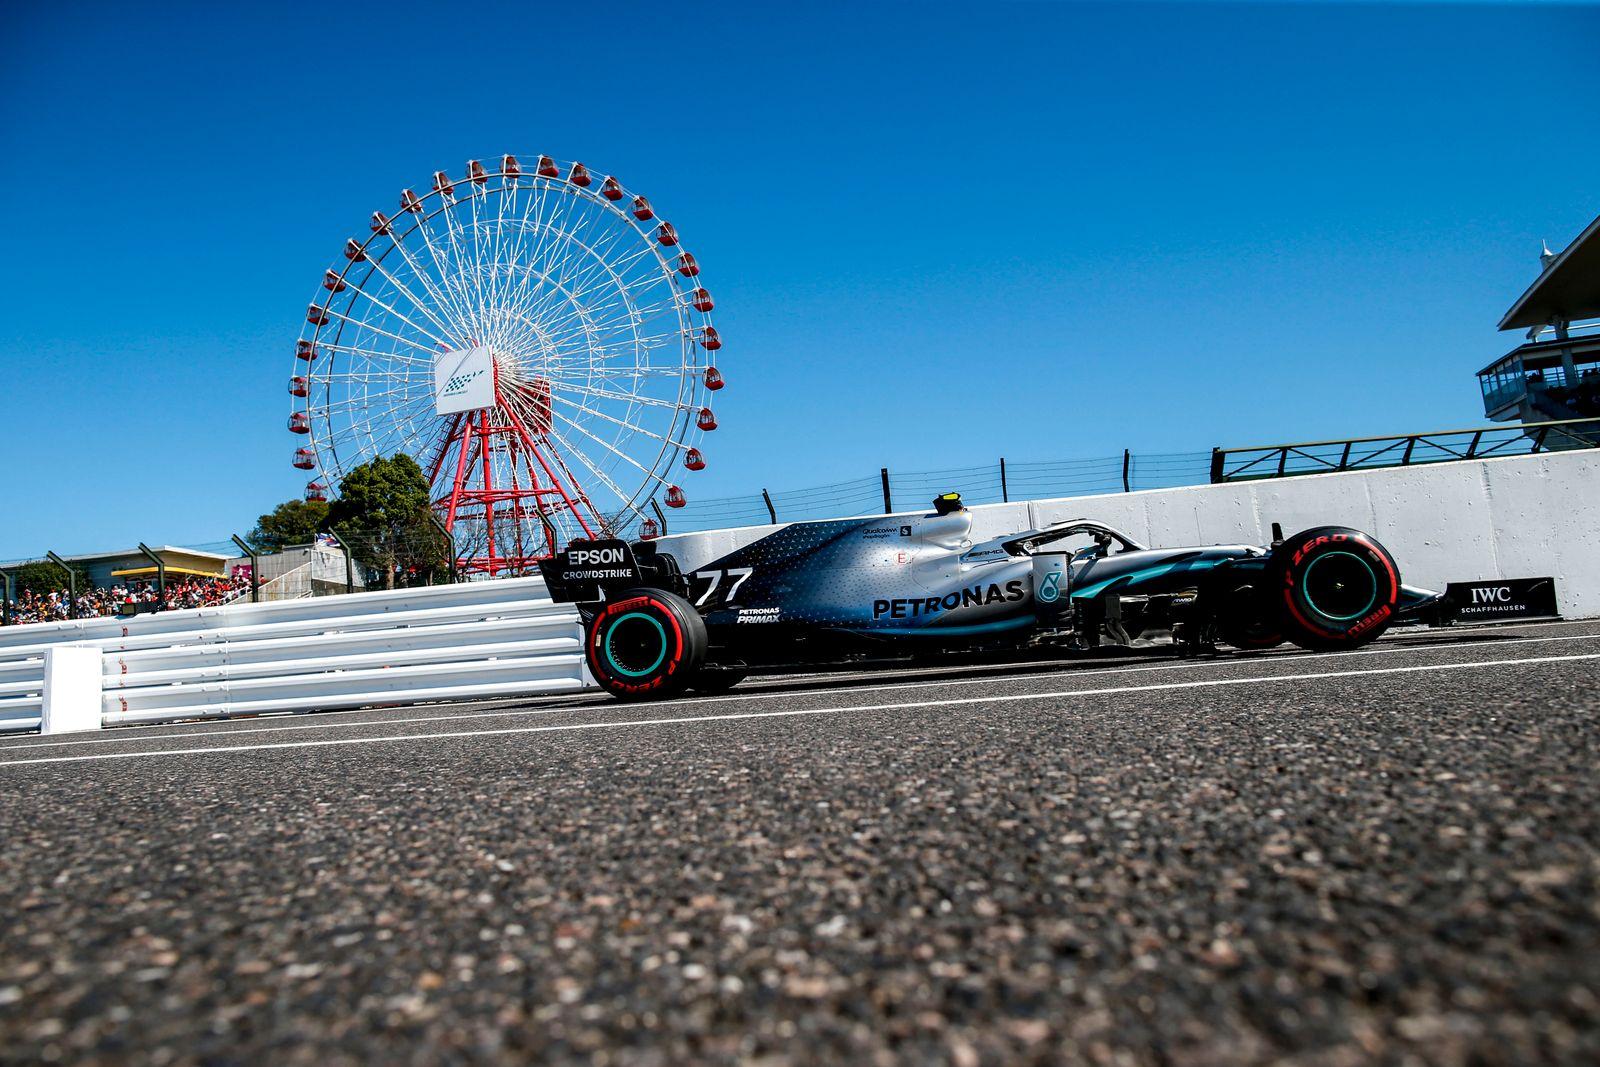 Motorsports: FIA Formula One World Championship, WM, Weltmeisterschaft 2019, Grand Prix of Japan, 77 Valtteri Bottas (F